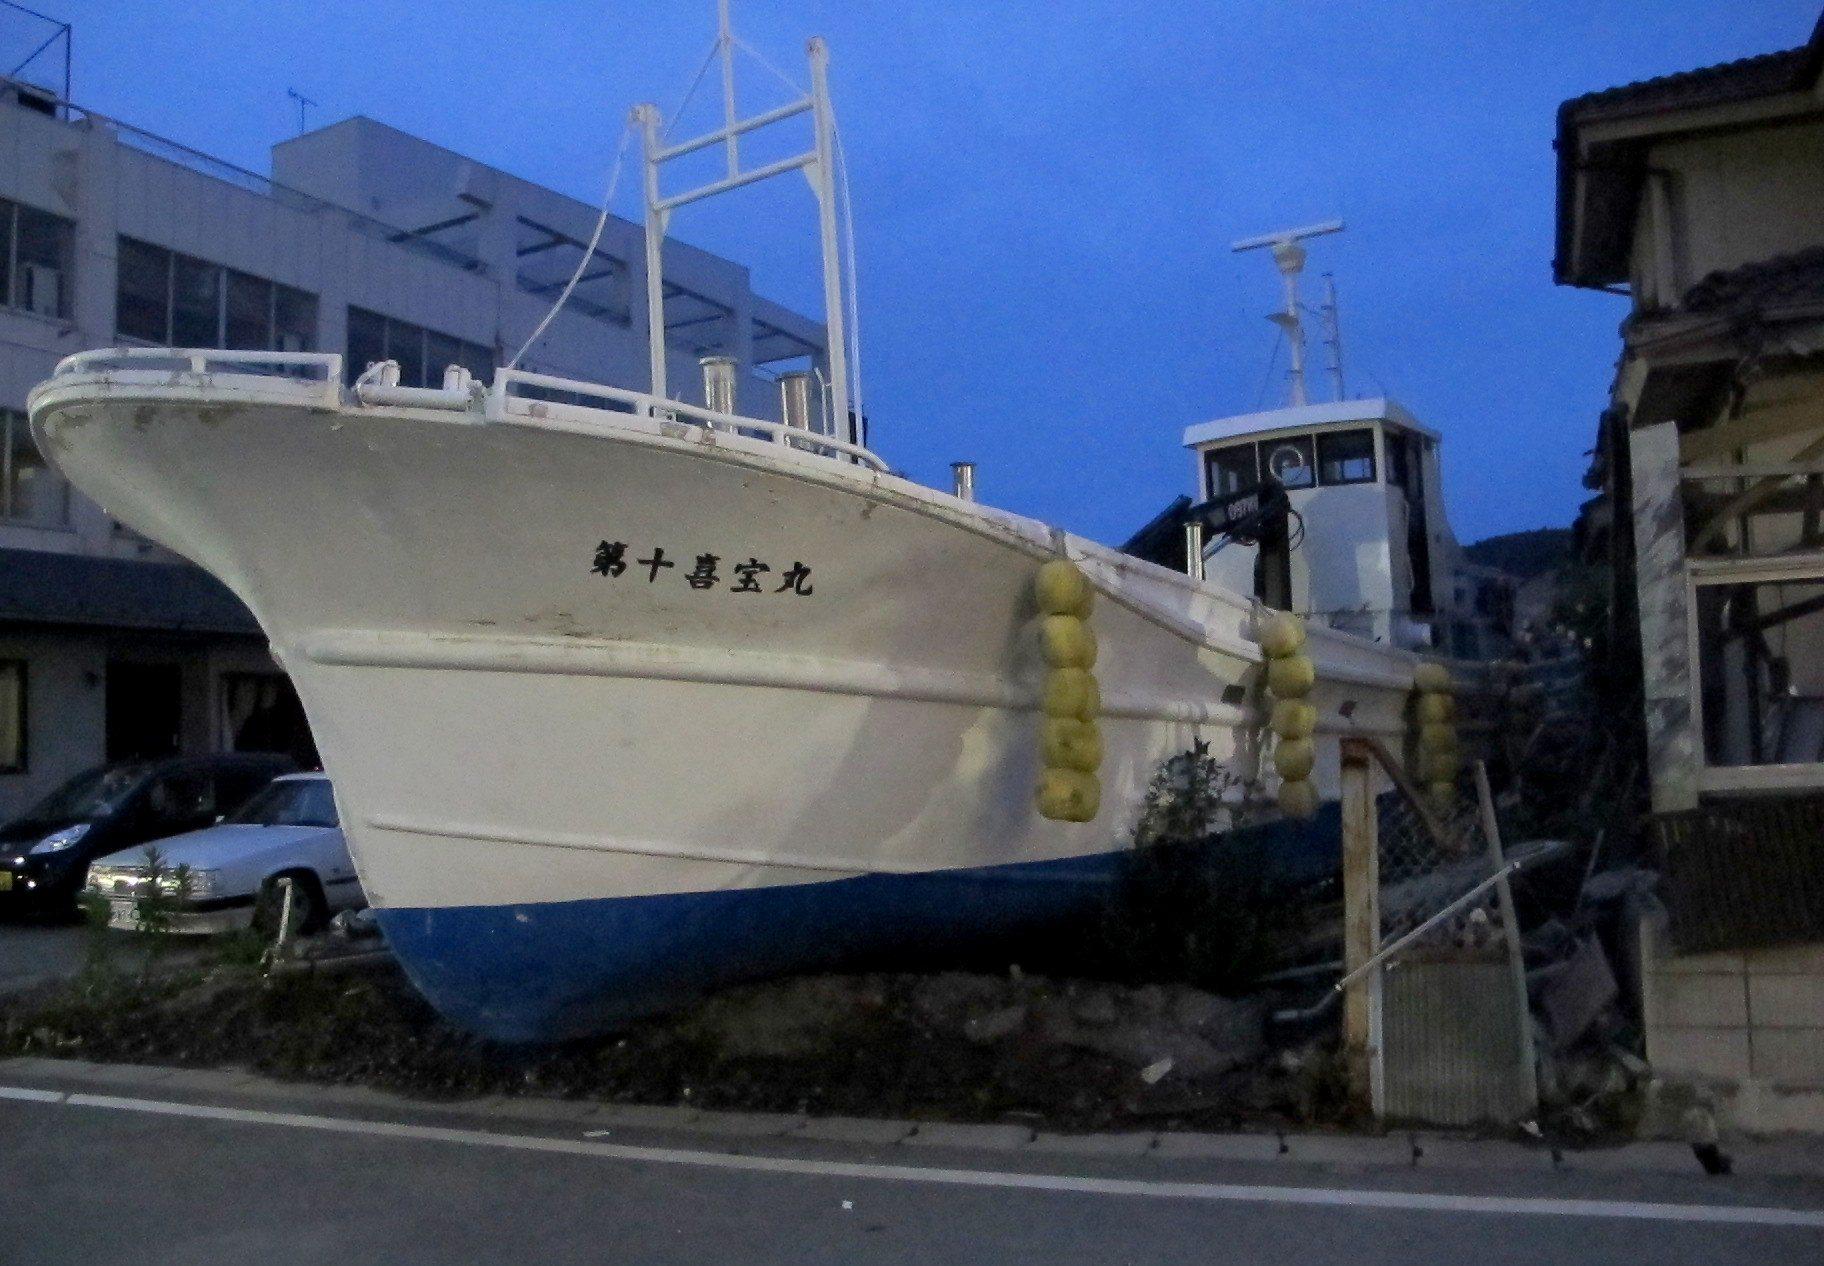 boat, Japan, Ishinomaki, street, earthquake, tsunami, 3.11, 2011, March 11, debris, Tohoku